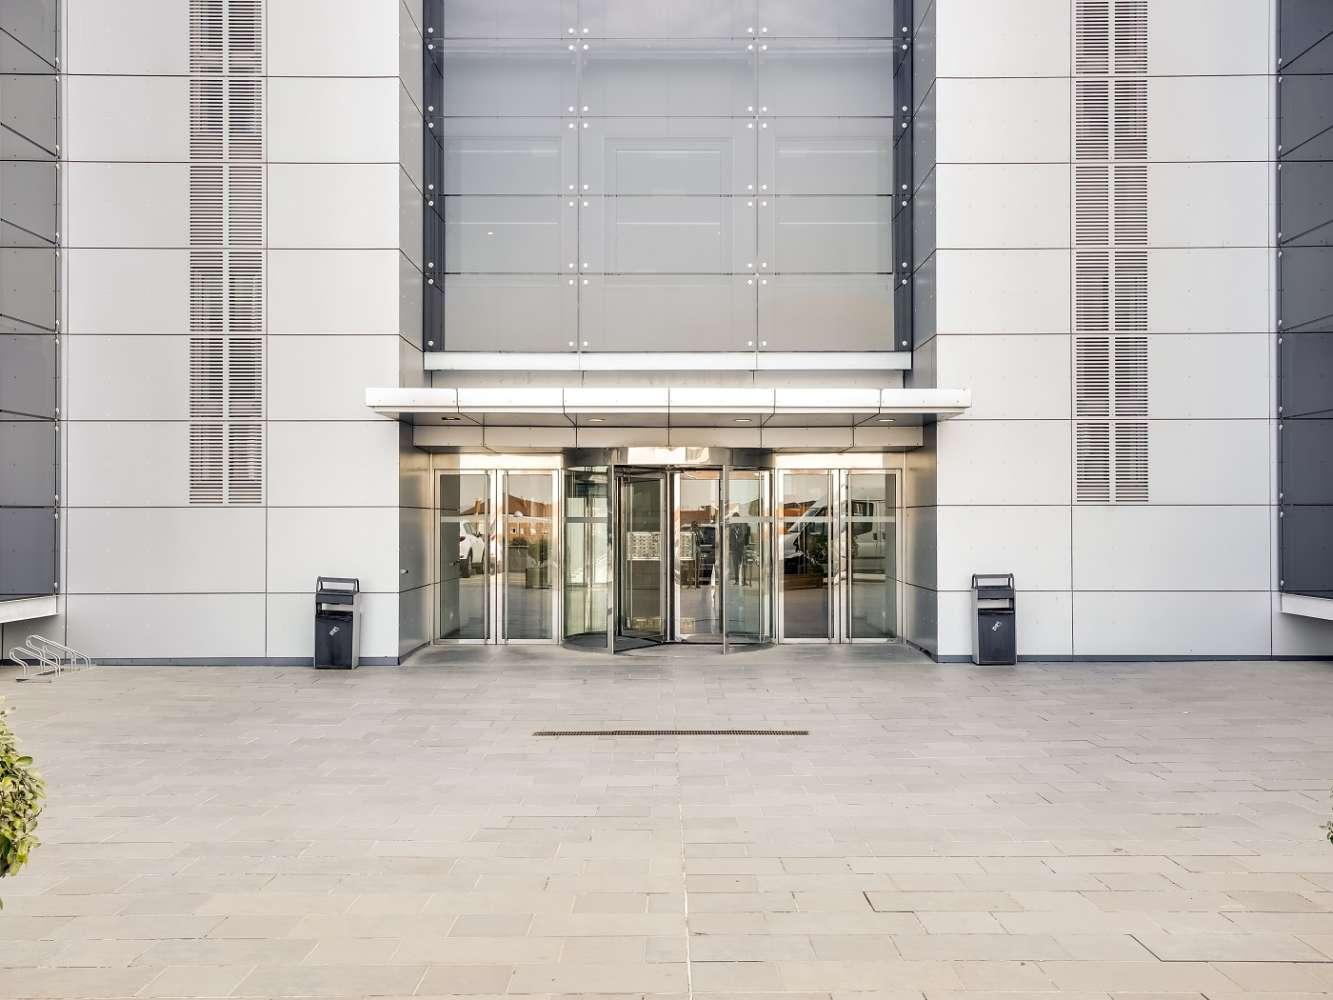 Oficina Las rozas de madrid, 28232 - Edificio 3. P.E. Alvia - 14371